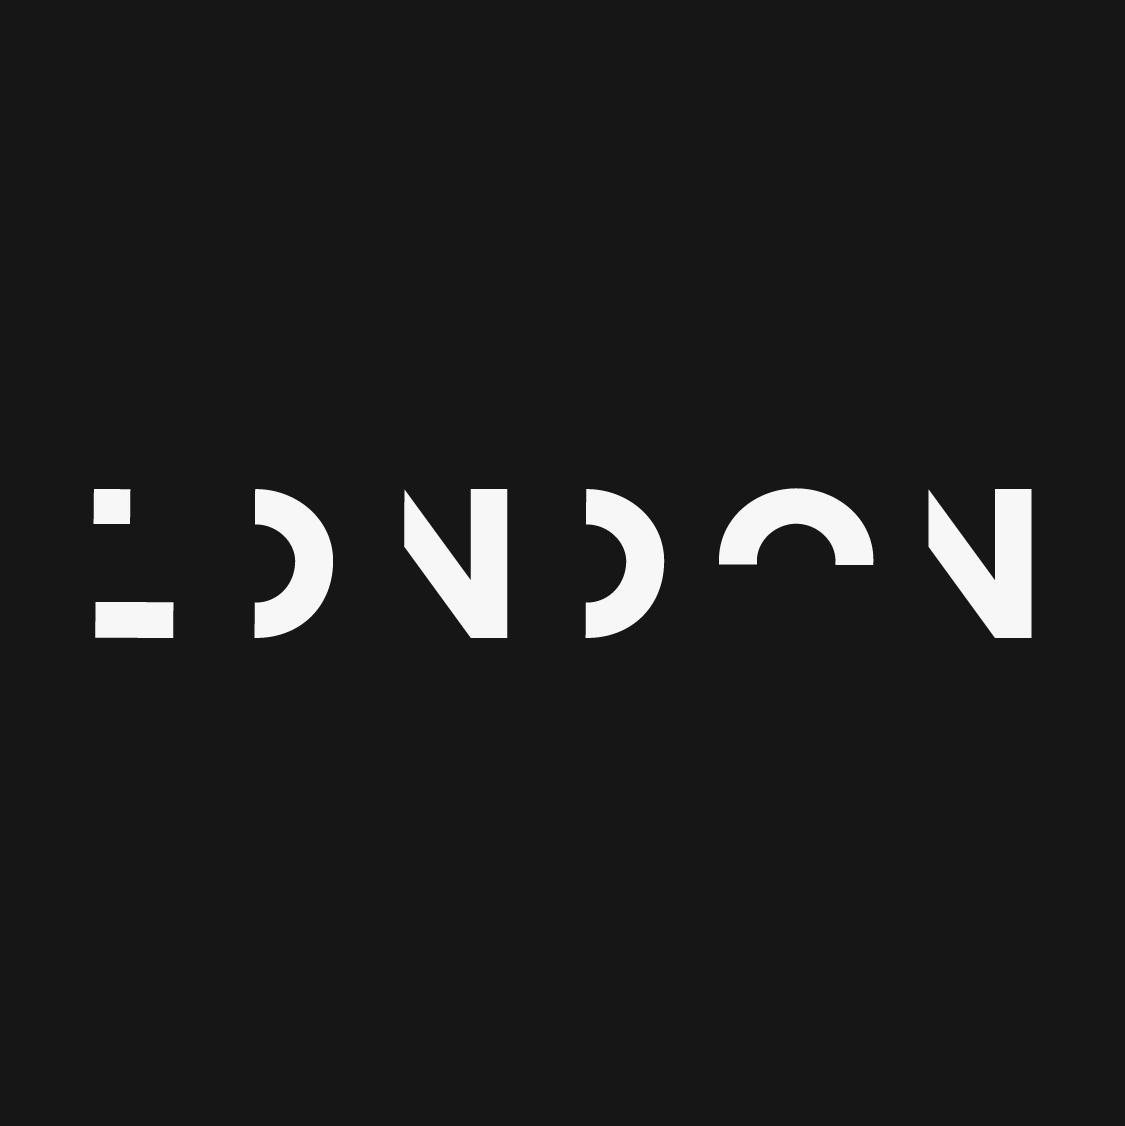 all-logos-2020-14